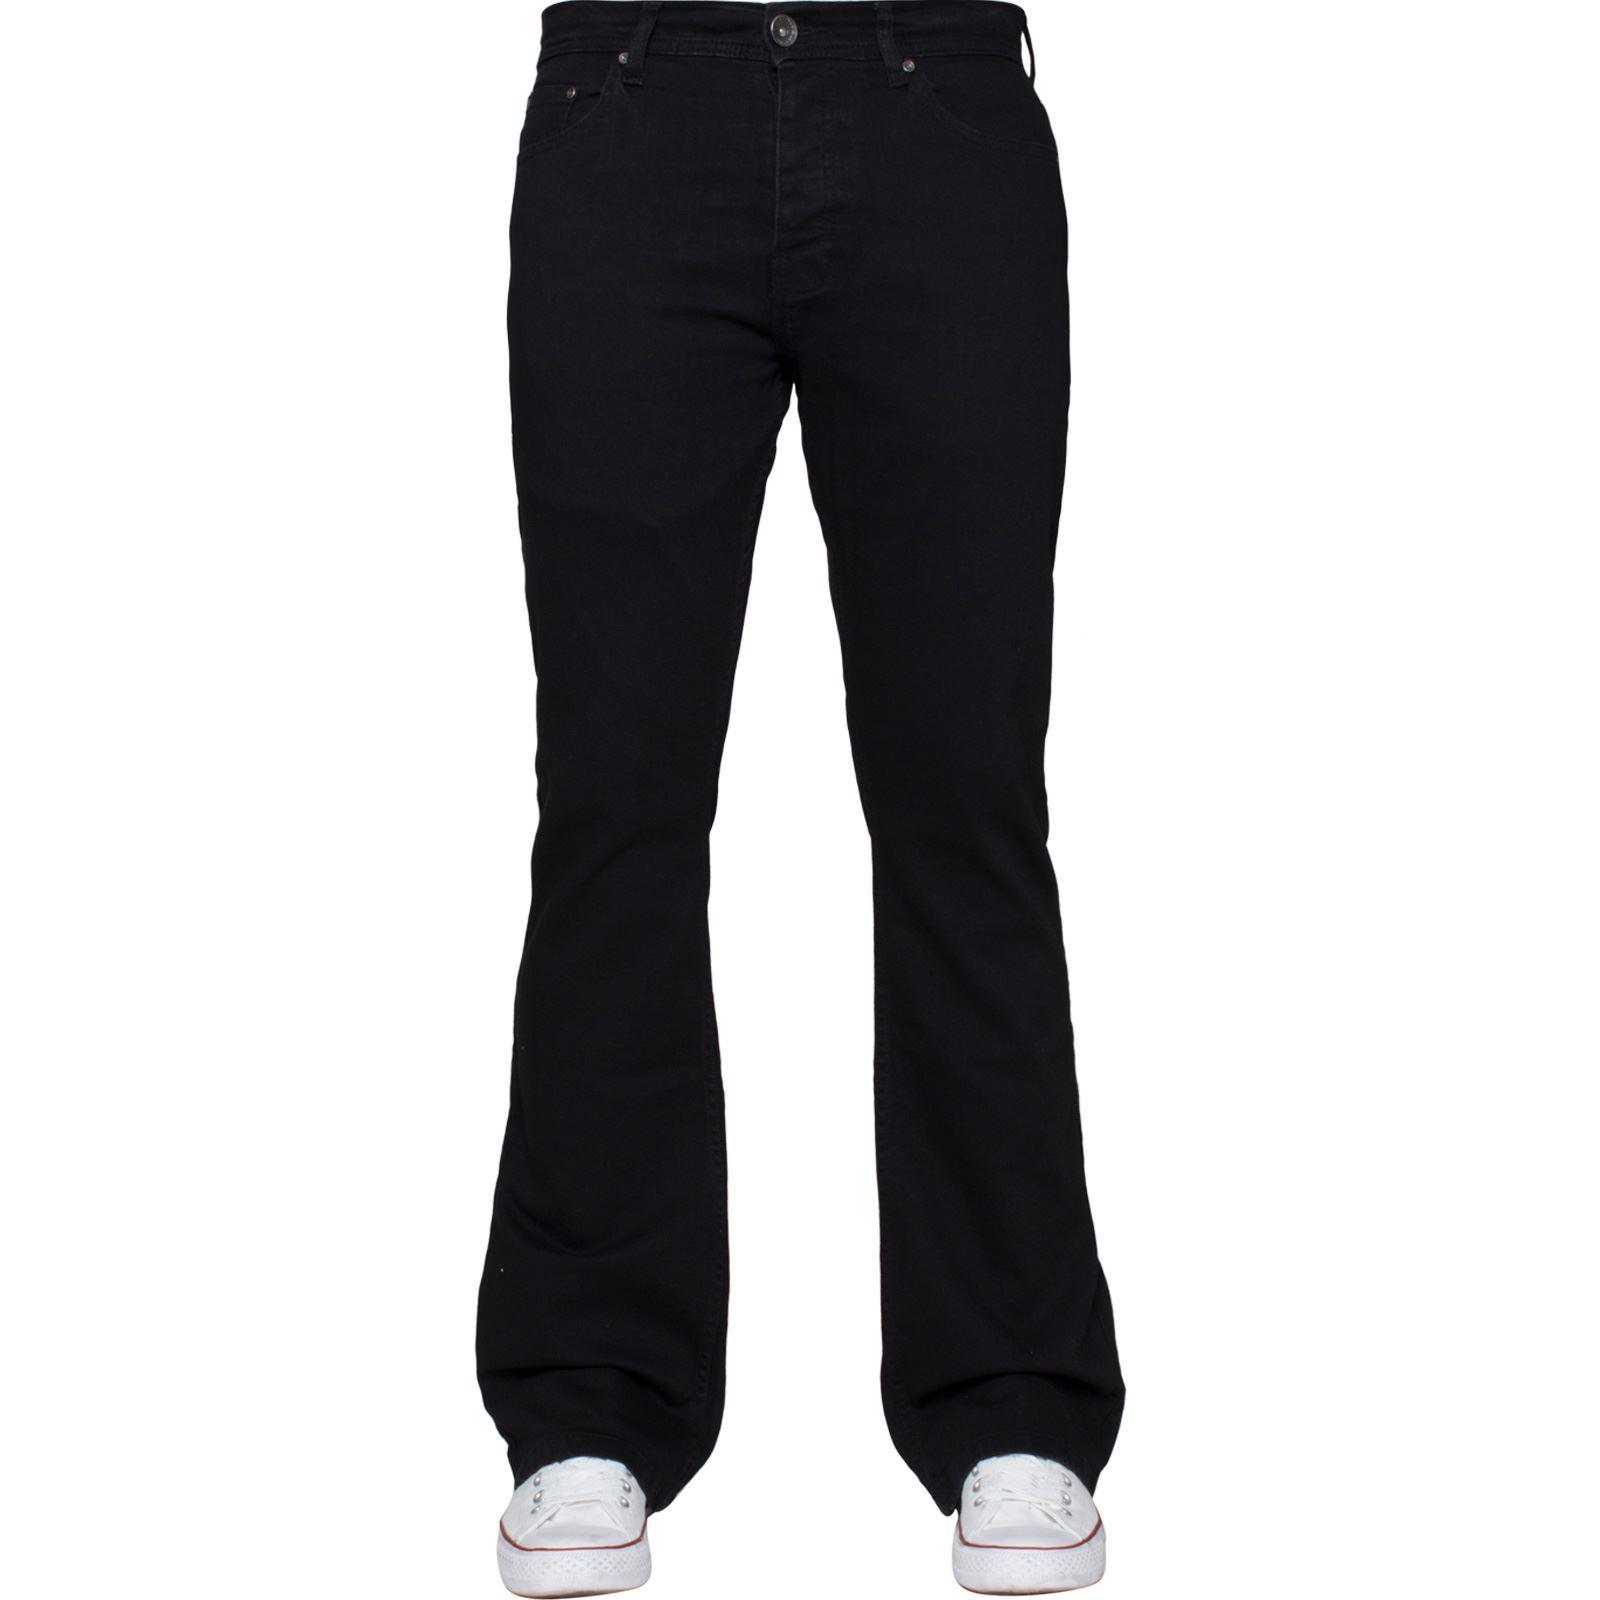 Para-Hombre-Pierna-Recta-Bootcut-Stretch-Denim-Regulares-Pantalon-de-trabajo-Kruze-Todas-Cinturas miniatura 71